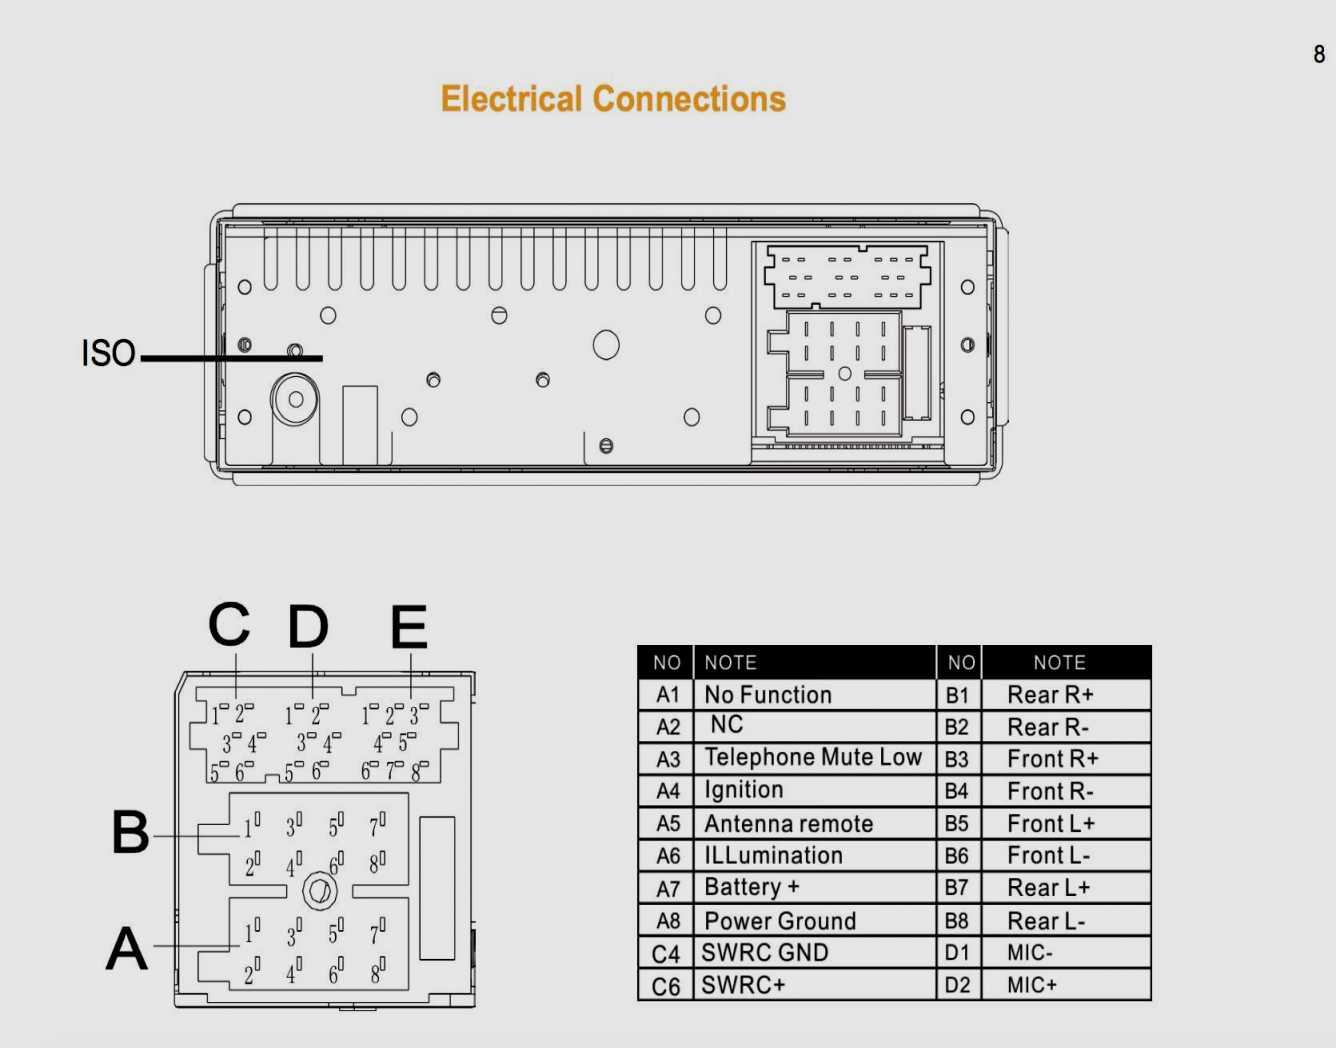 Alpine Ktp 445 Wiring Diagram | Wiring Diagram - Alpine Ktp 445 Wiring Diagram